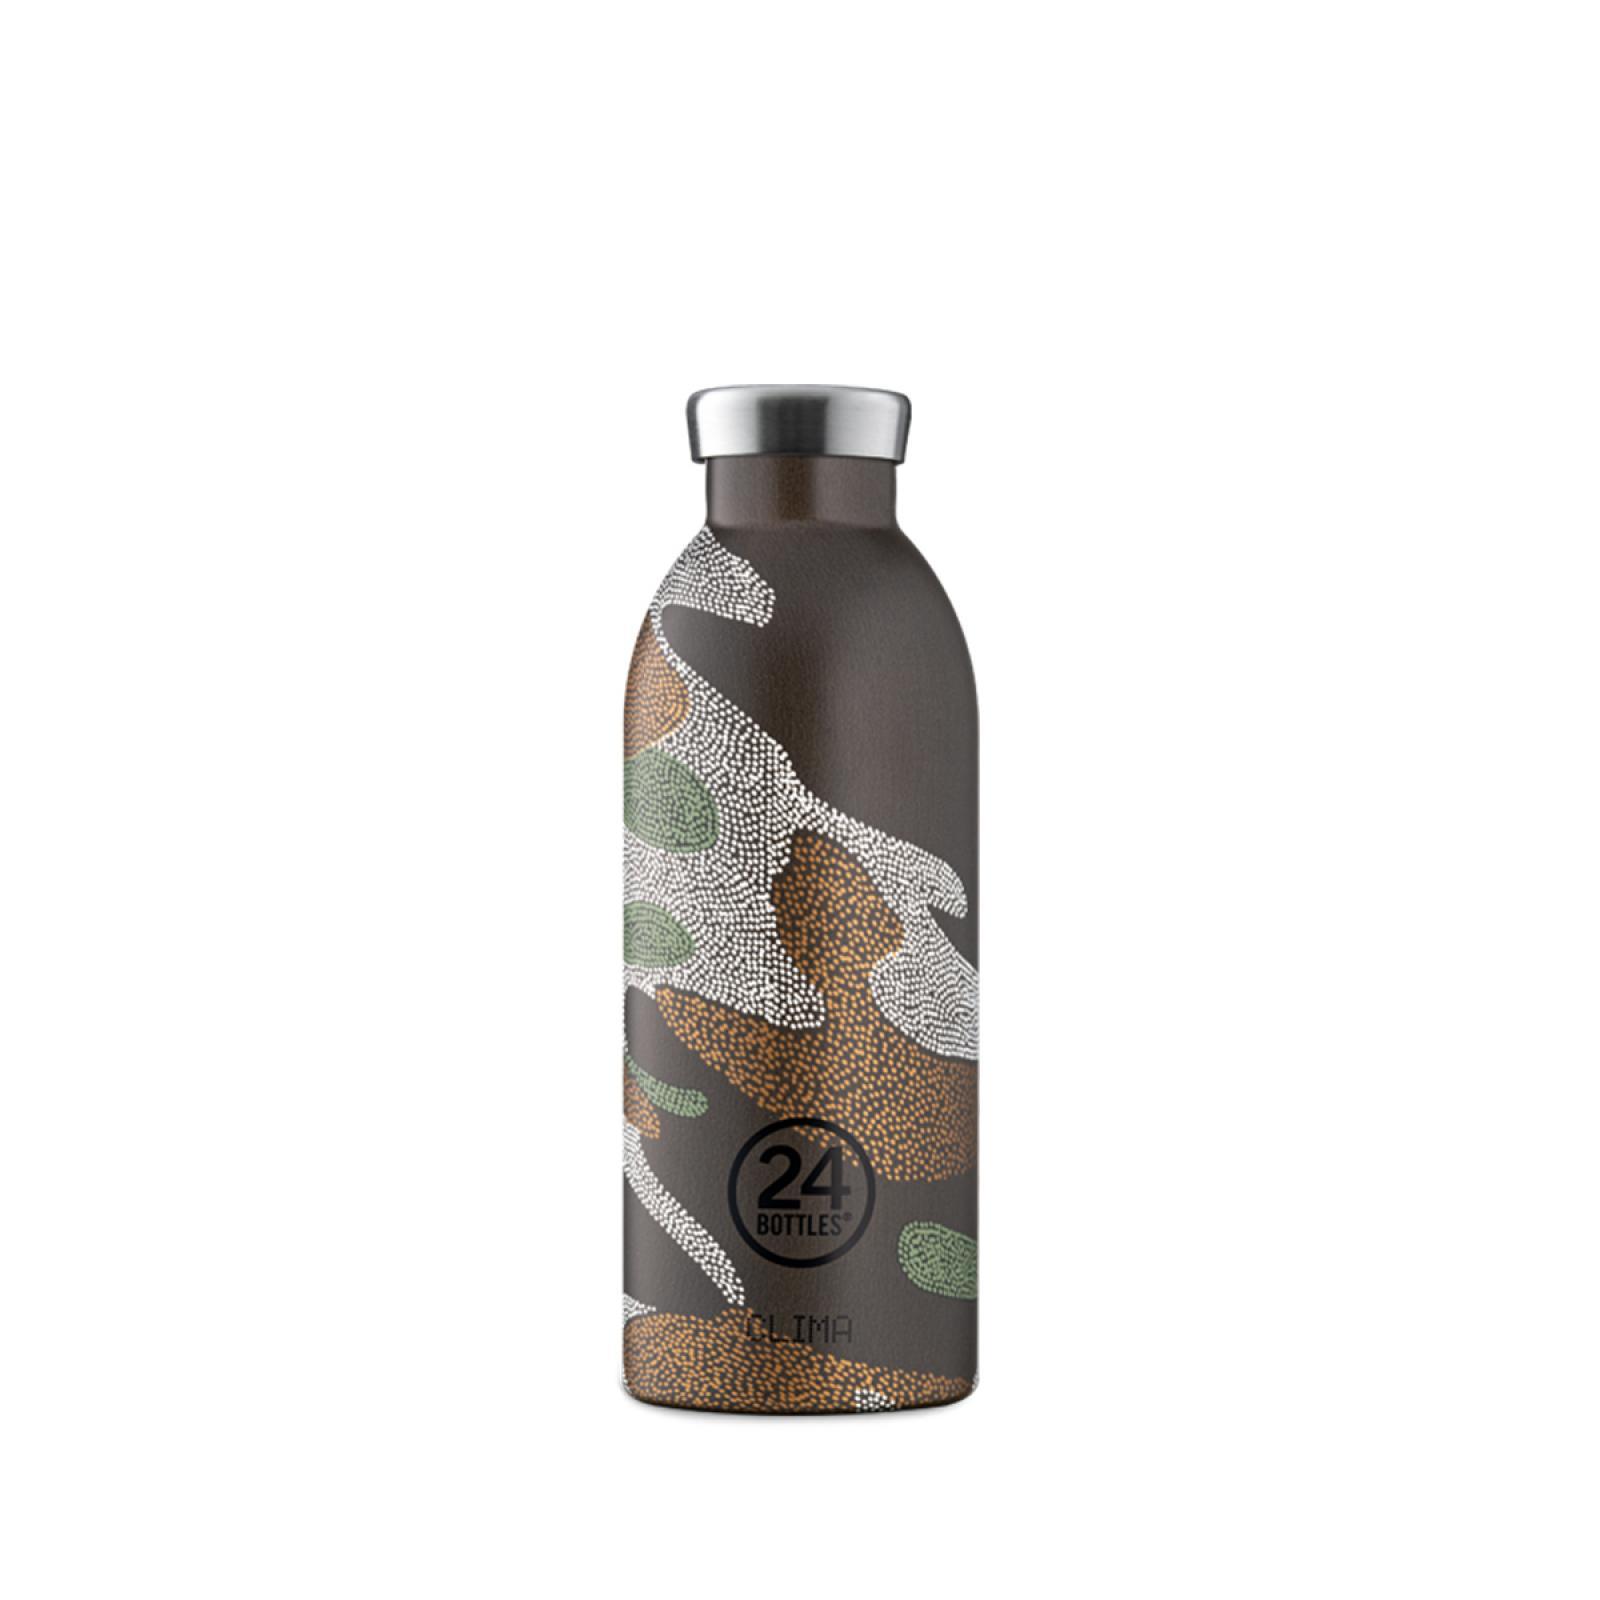 24 Bottles Clima Bottle Camo Zone 500 ml - 1